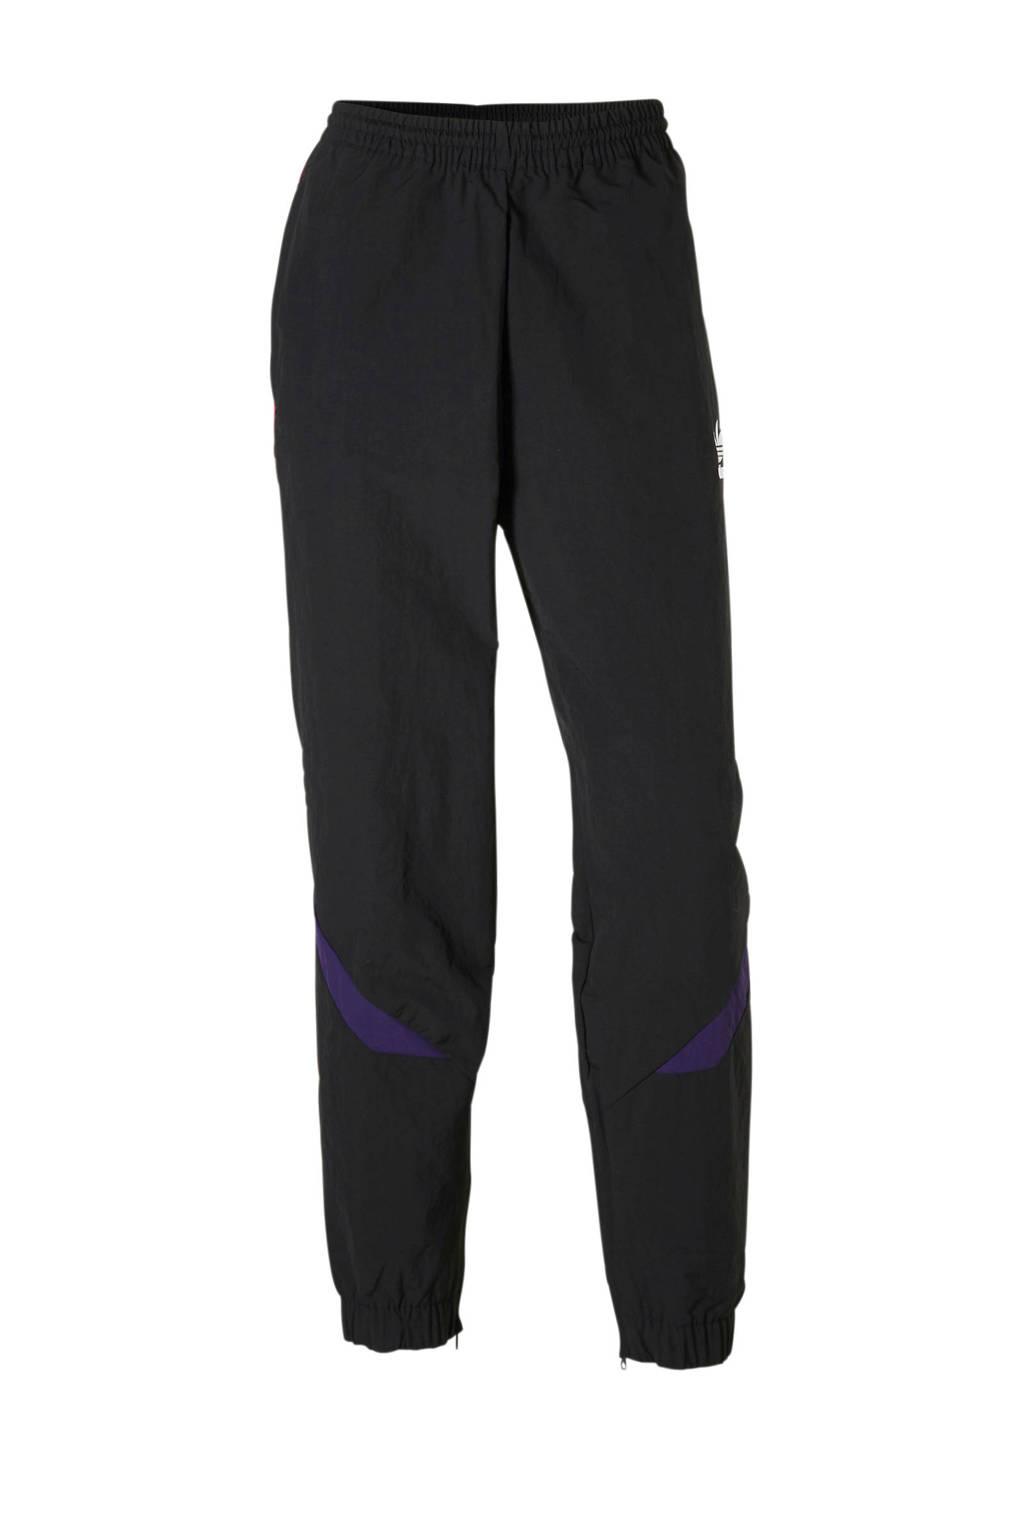 adidas originals trainingsbroek, Zwart/roze/paars